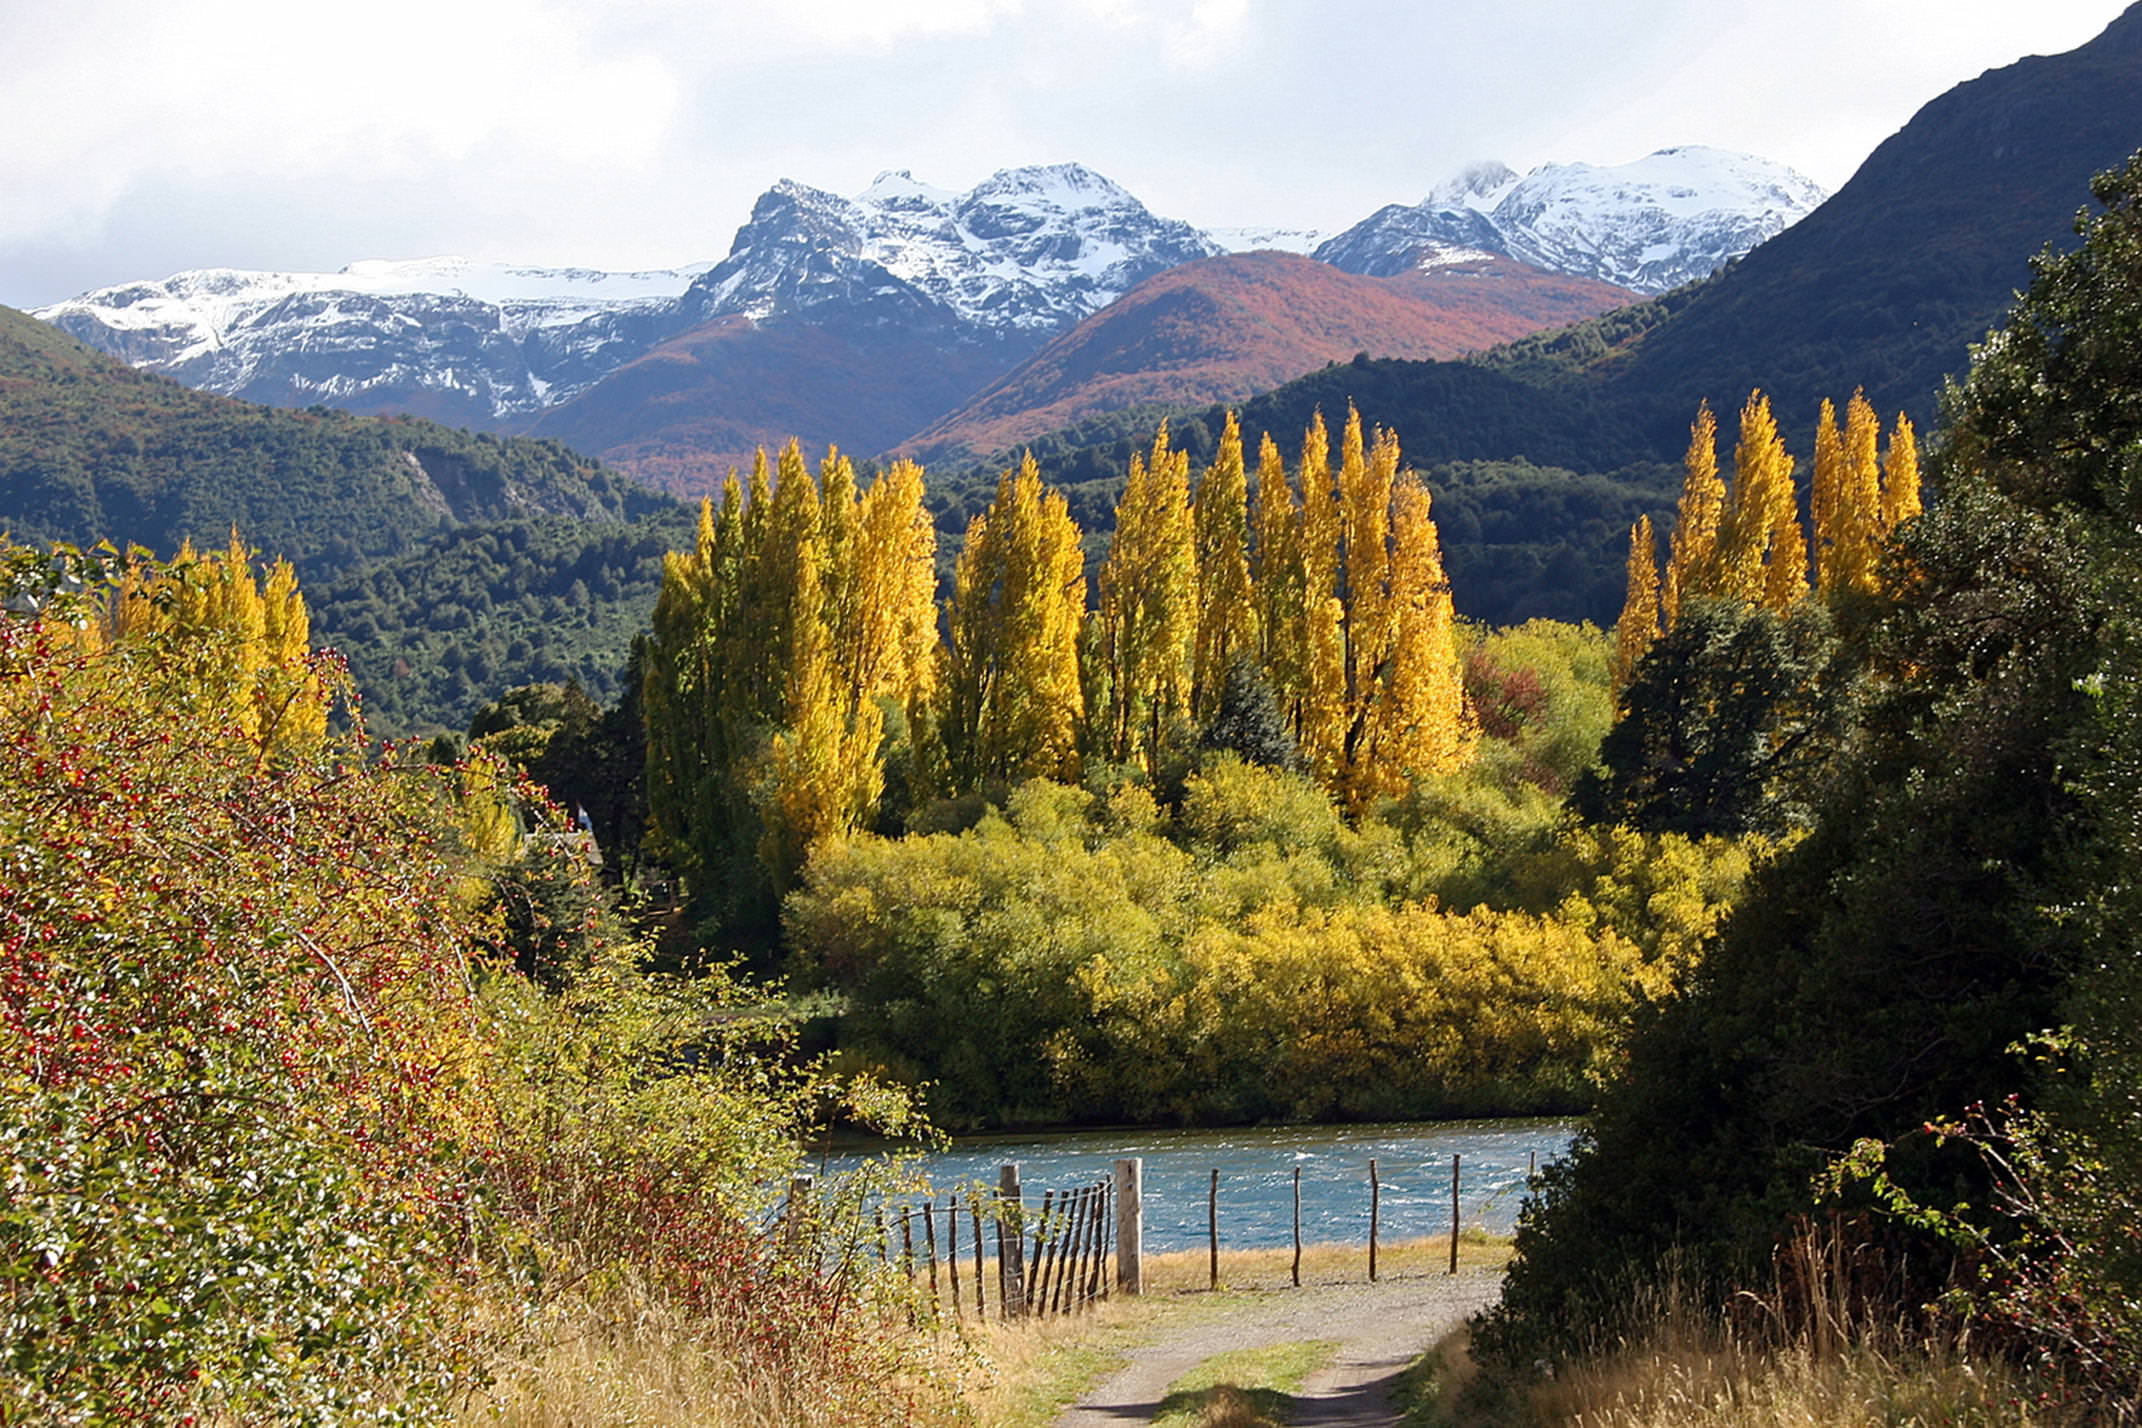 Argentina patagonia ruta 40 esquel fall colours c jeremy wood